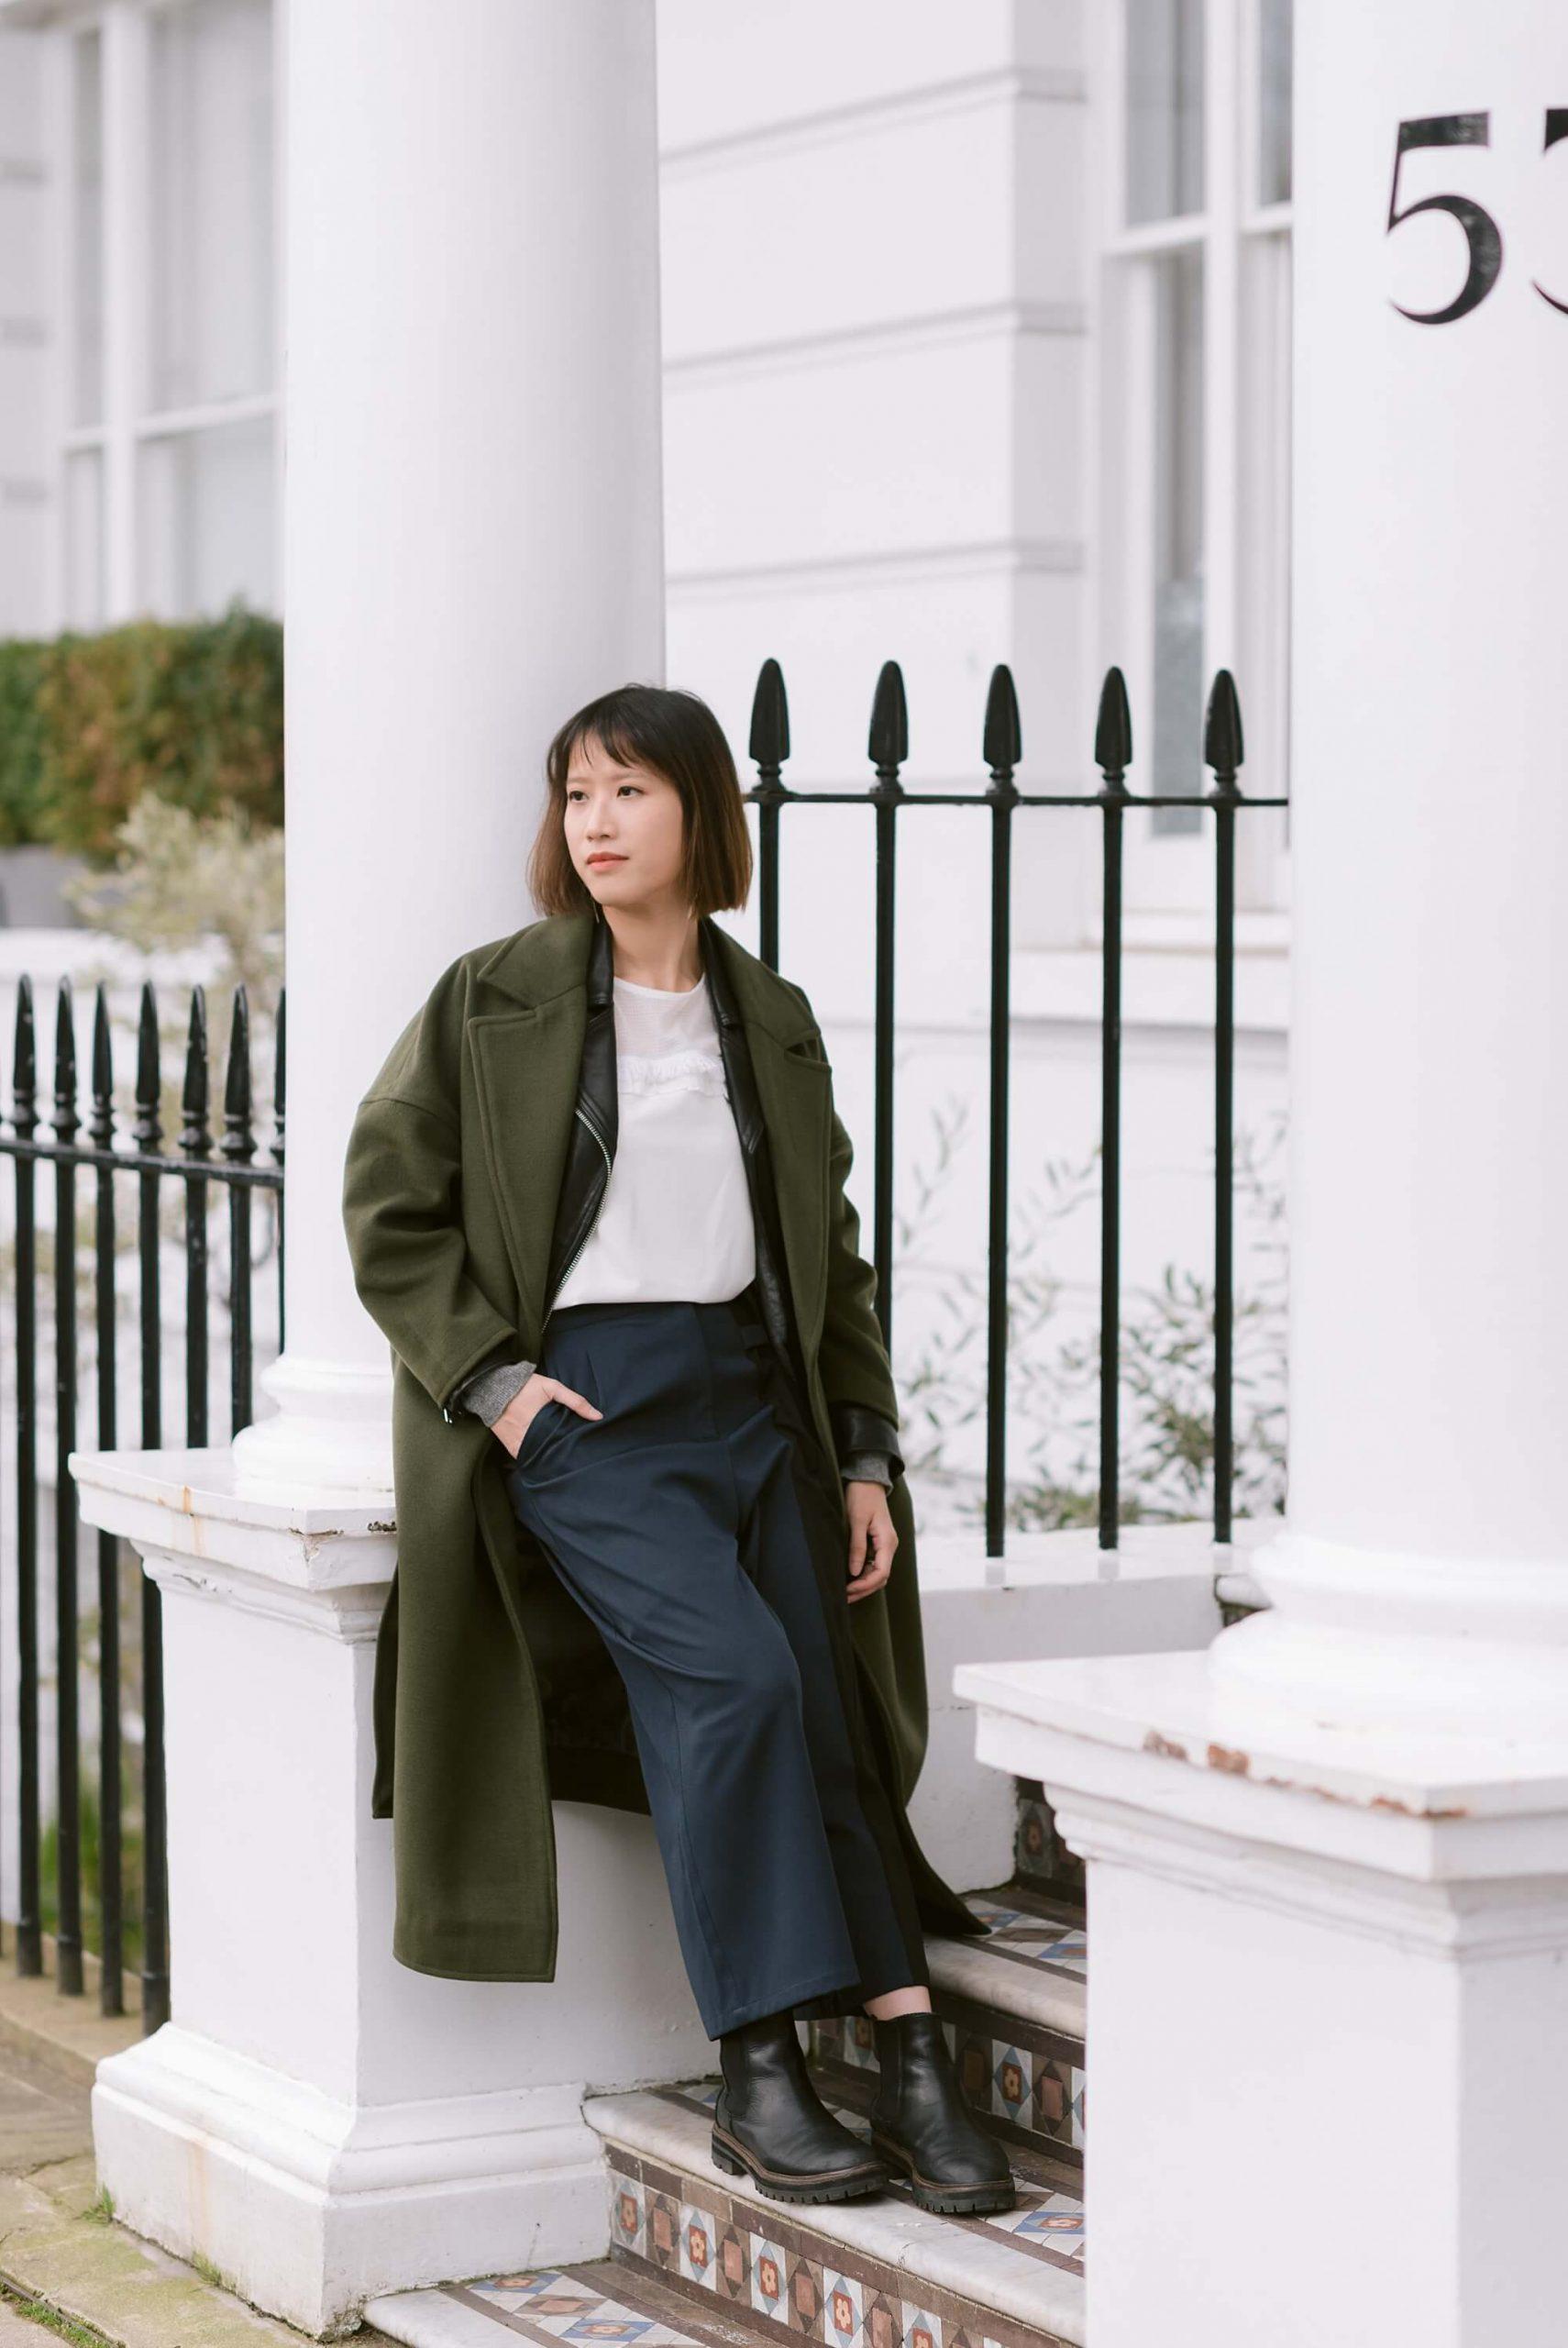 branding photography London by Eva Tarnok luxury wedding photographer